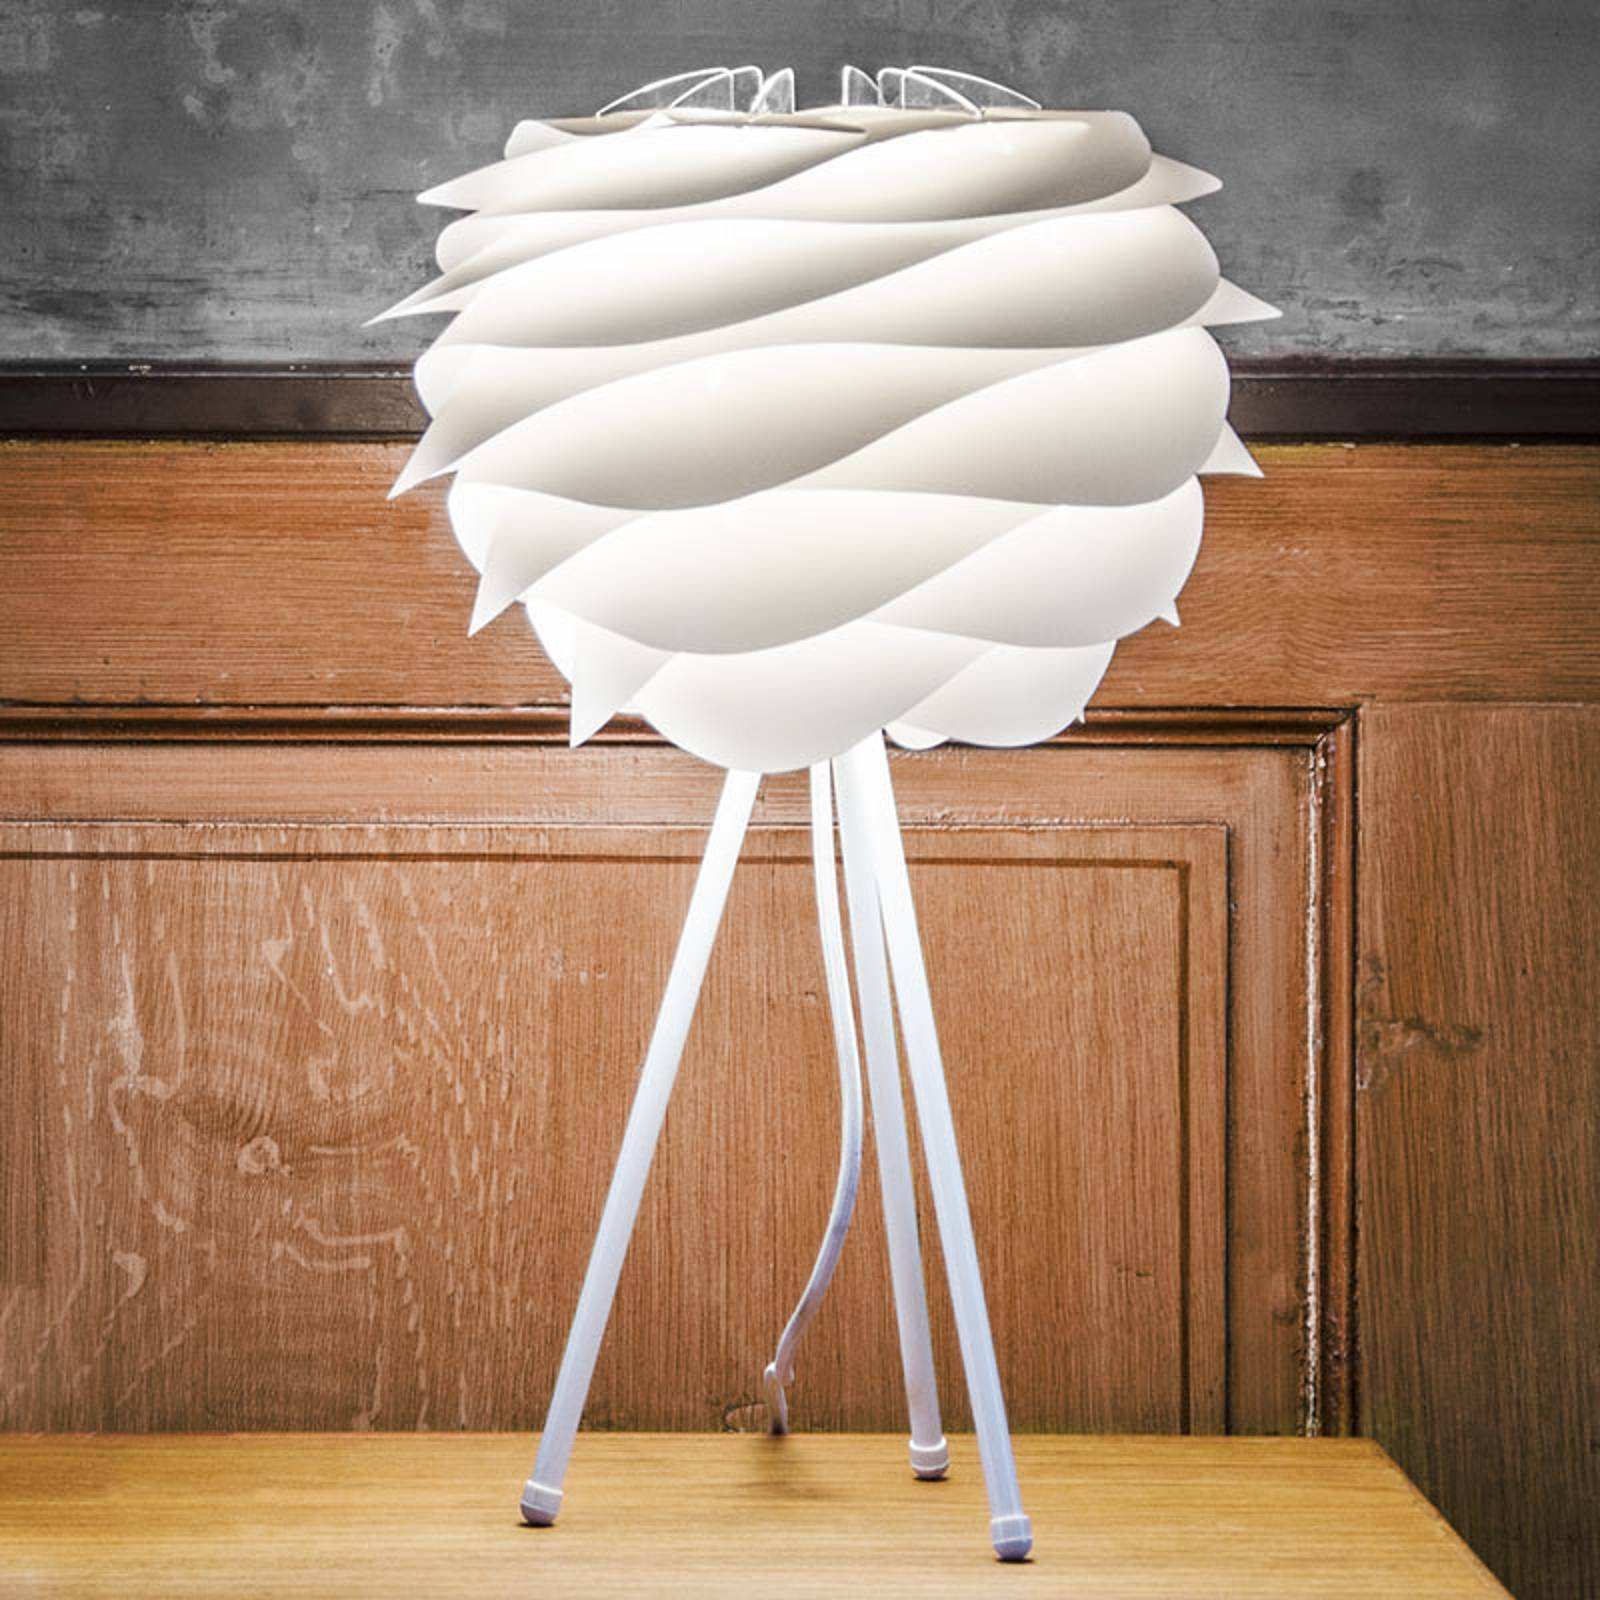 Hvit bordlampe Carmina med stativ med tre ben.